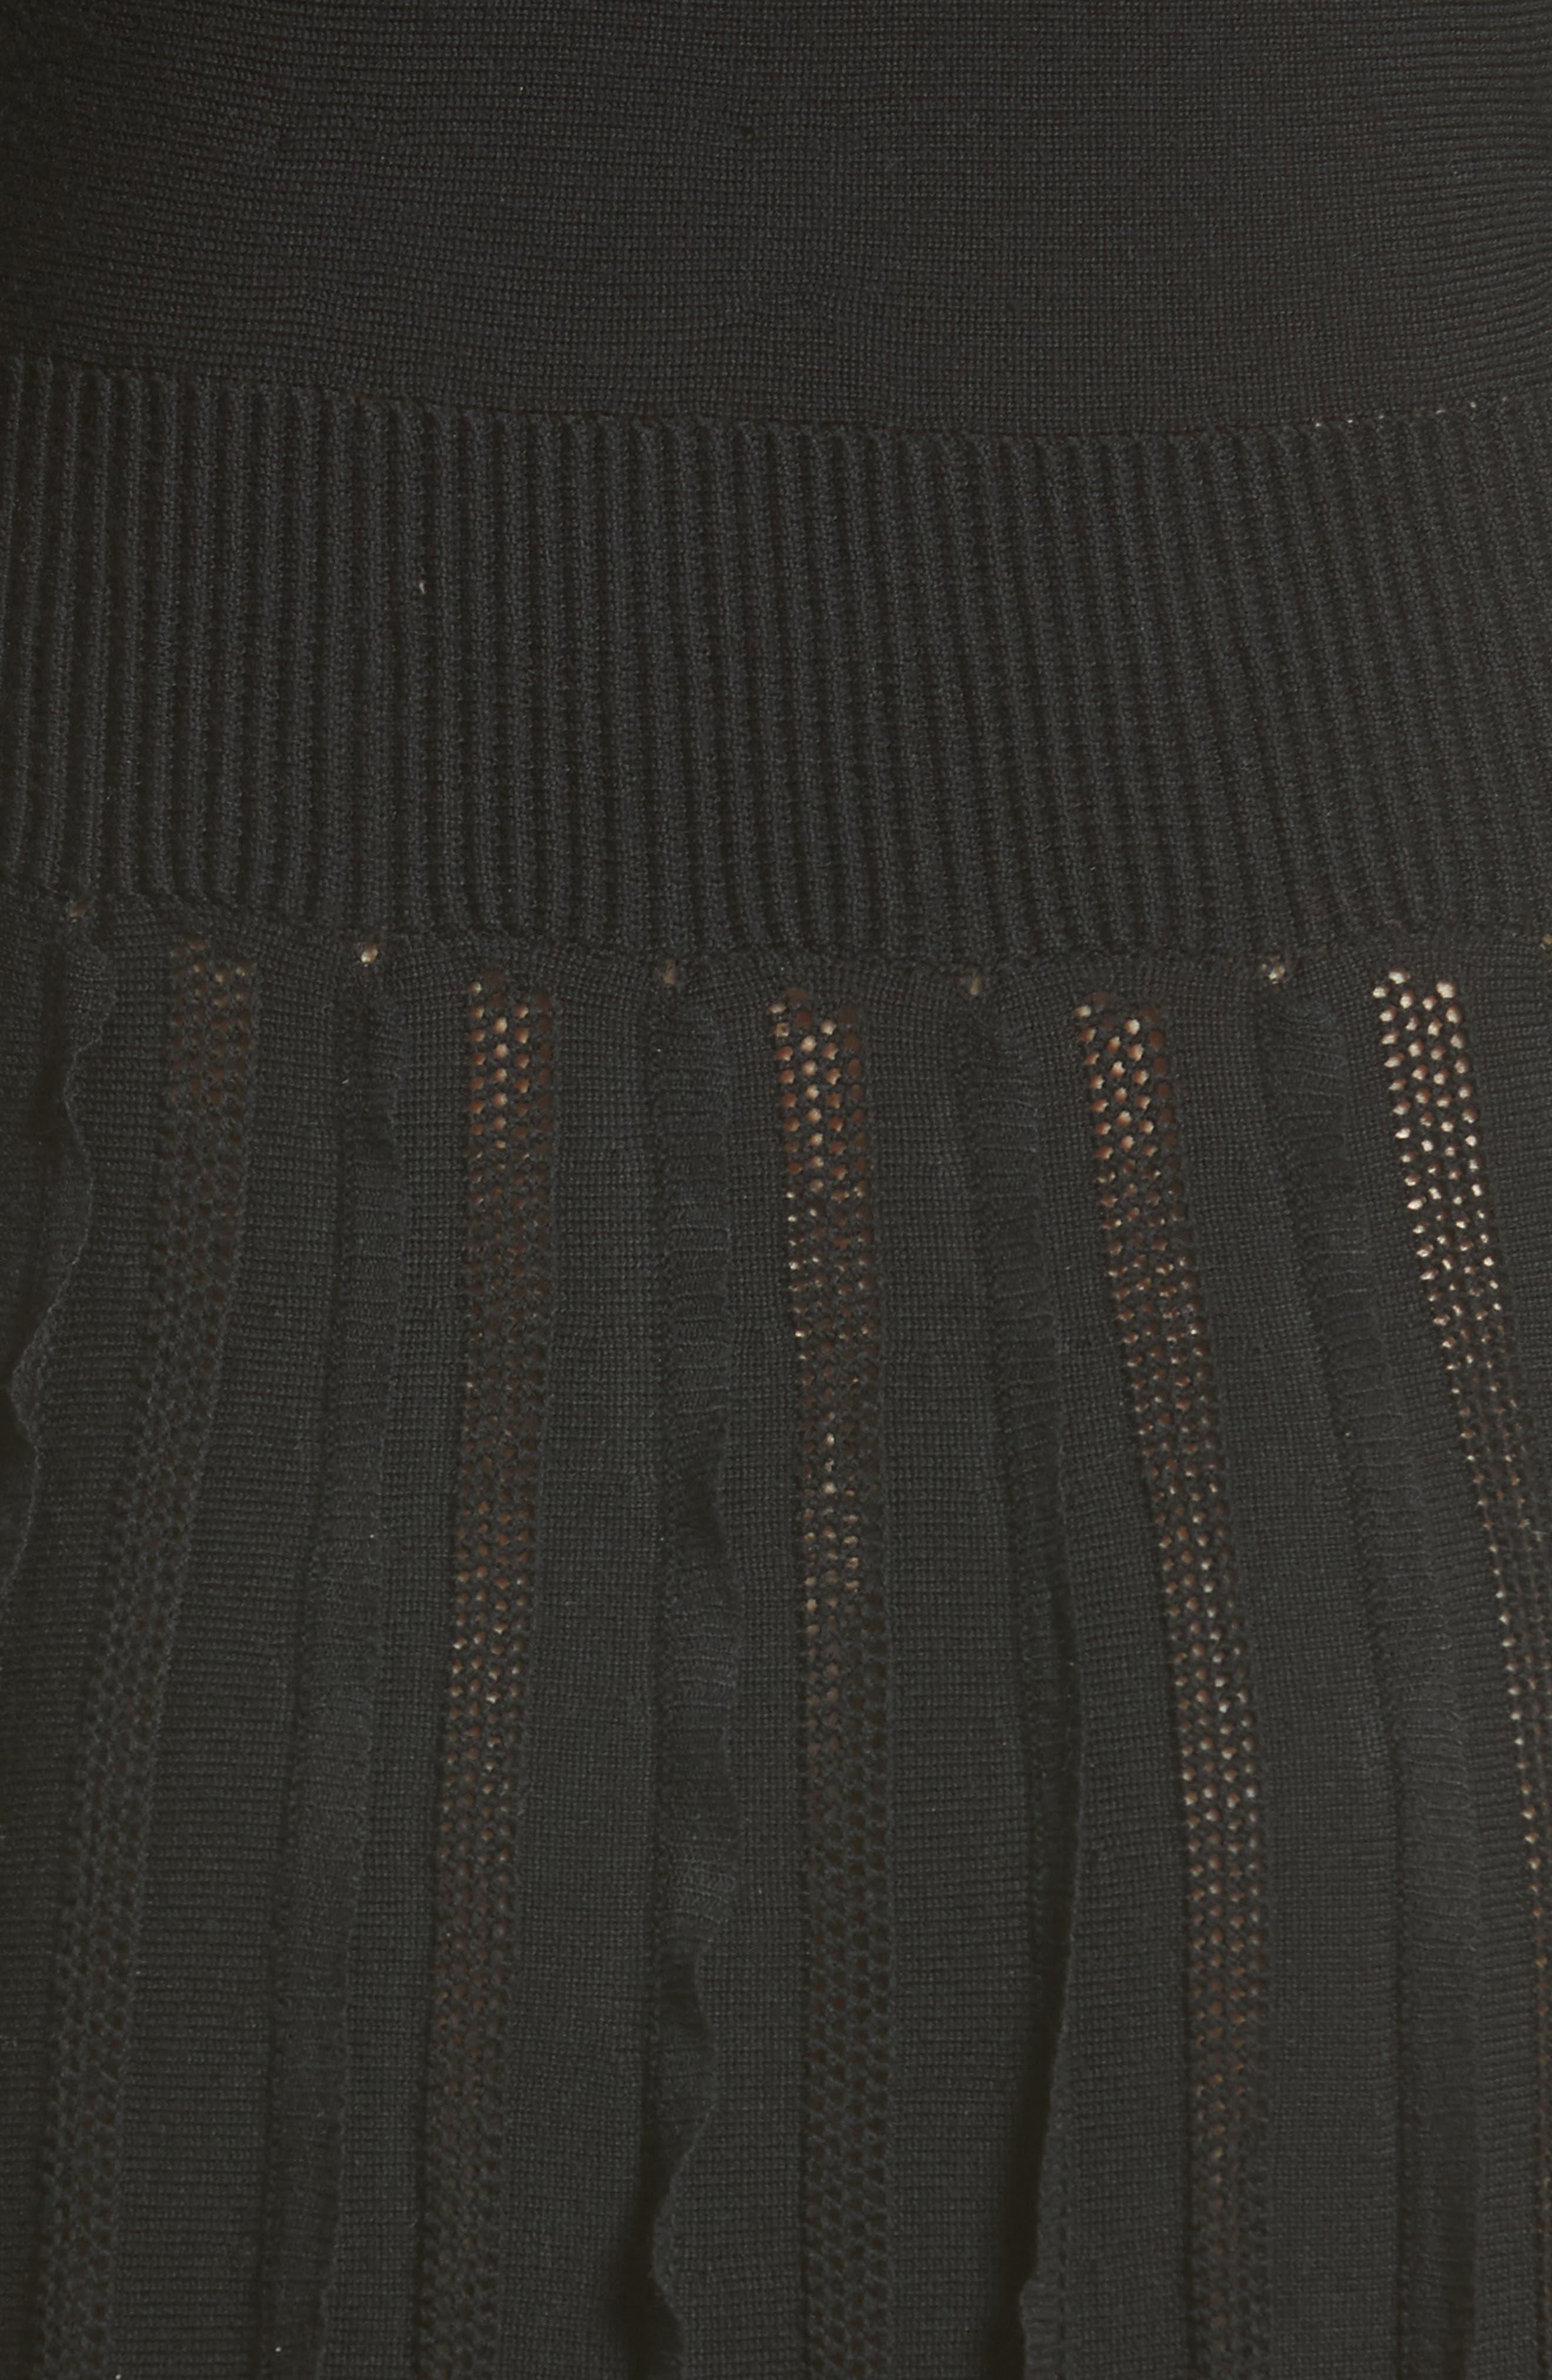 Ruffle Skirt Wool Knit Dress,                             Alternate thumbnail 5, color,                             001